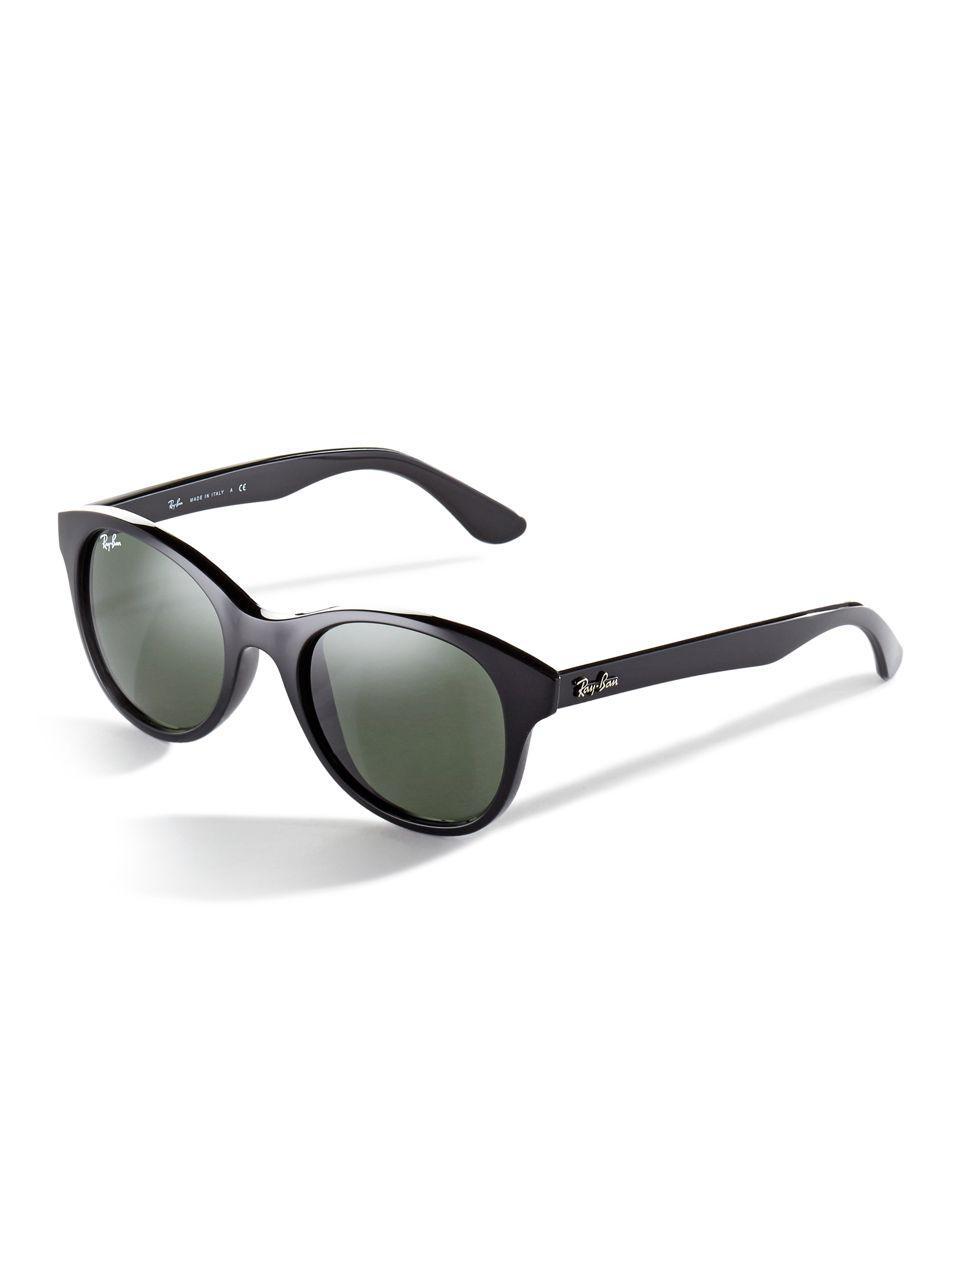 5f80f9a616 Lyst - Ray-Ban Rb4203 Wayfarer Sunglasses in Black